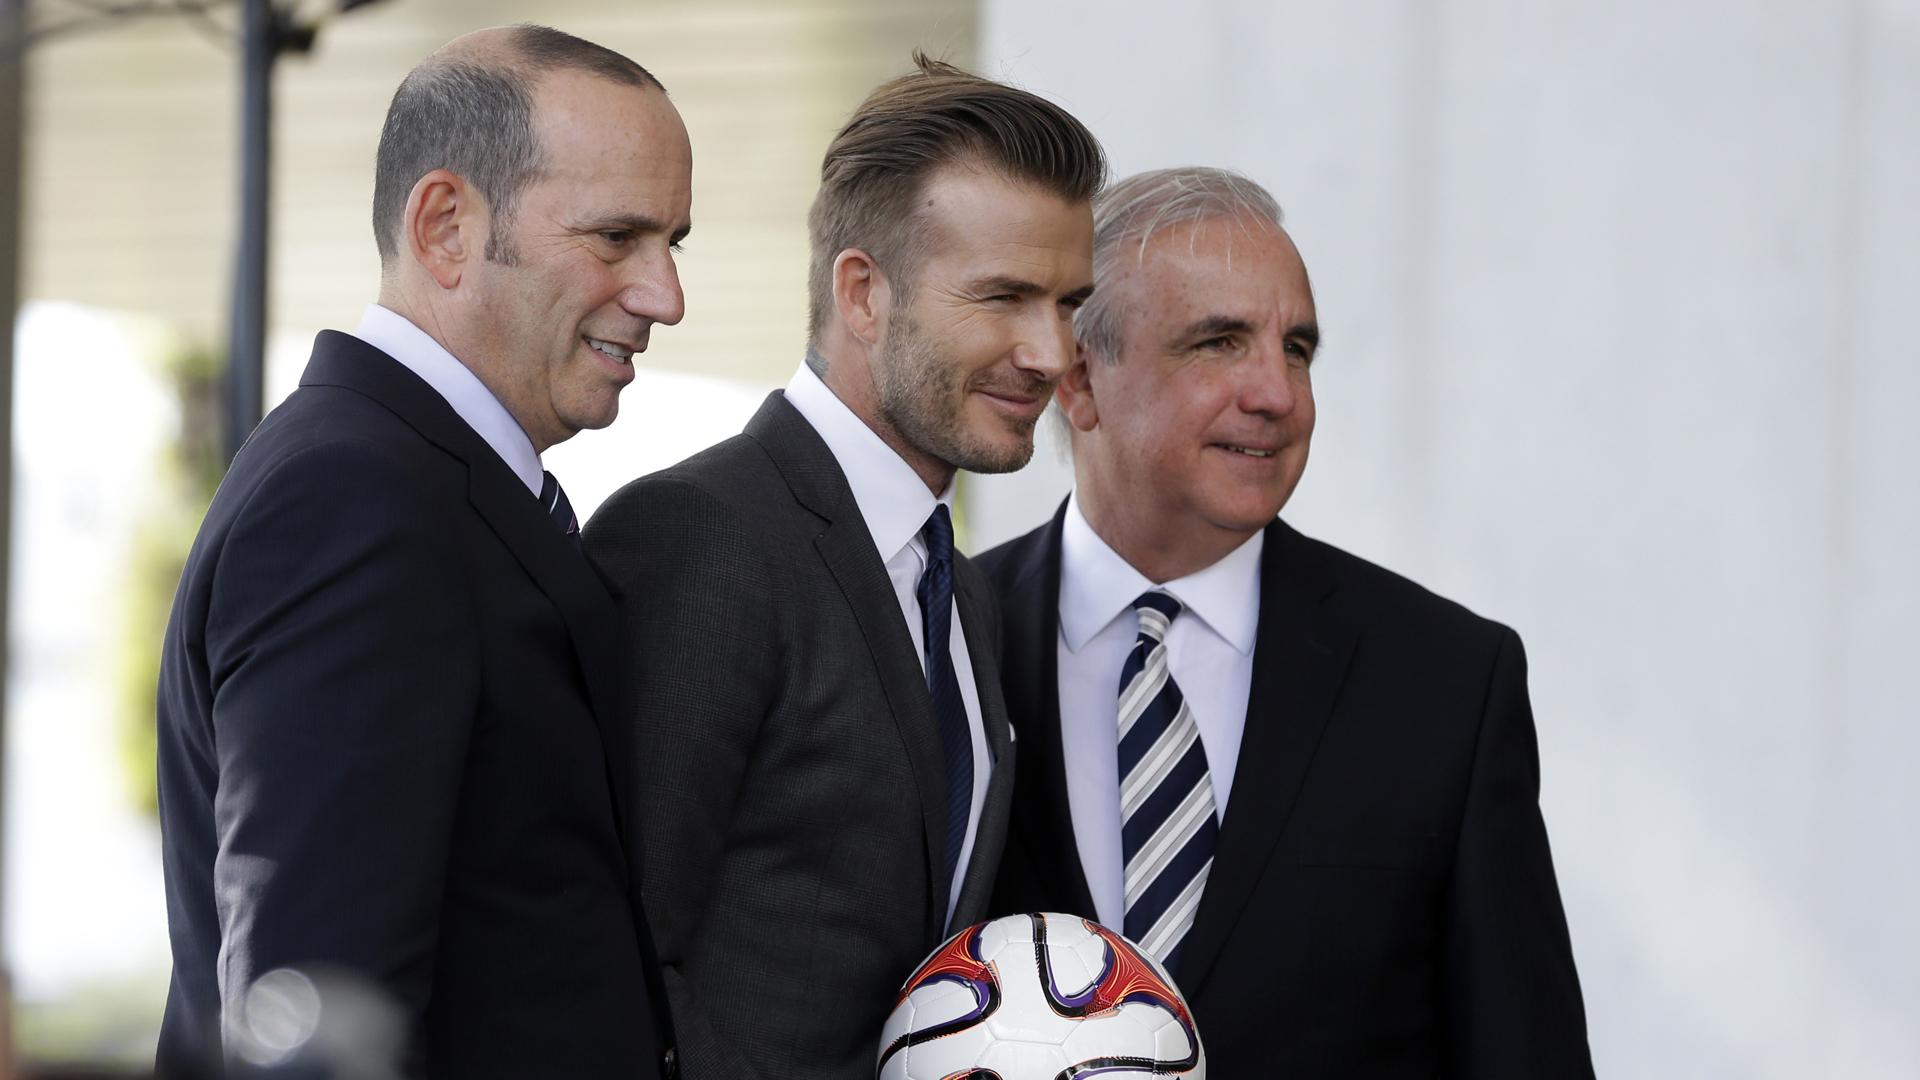 David-Beckham-FTR-020514.jpg